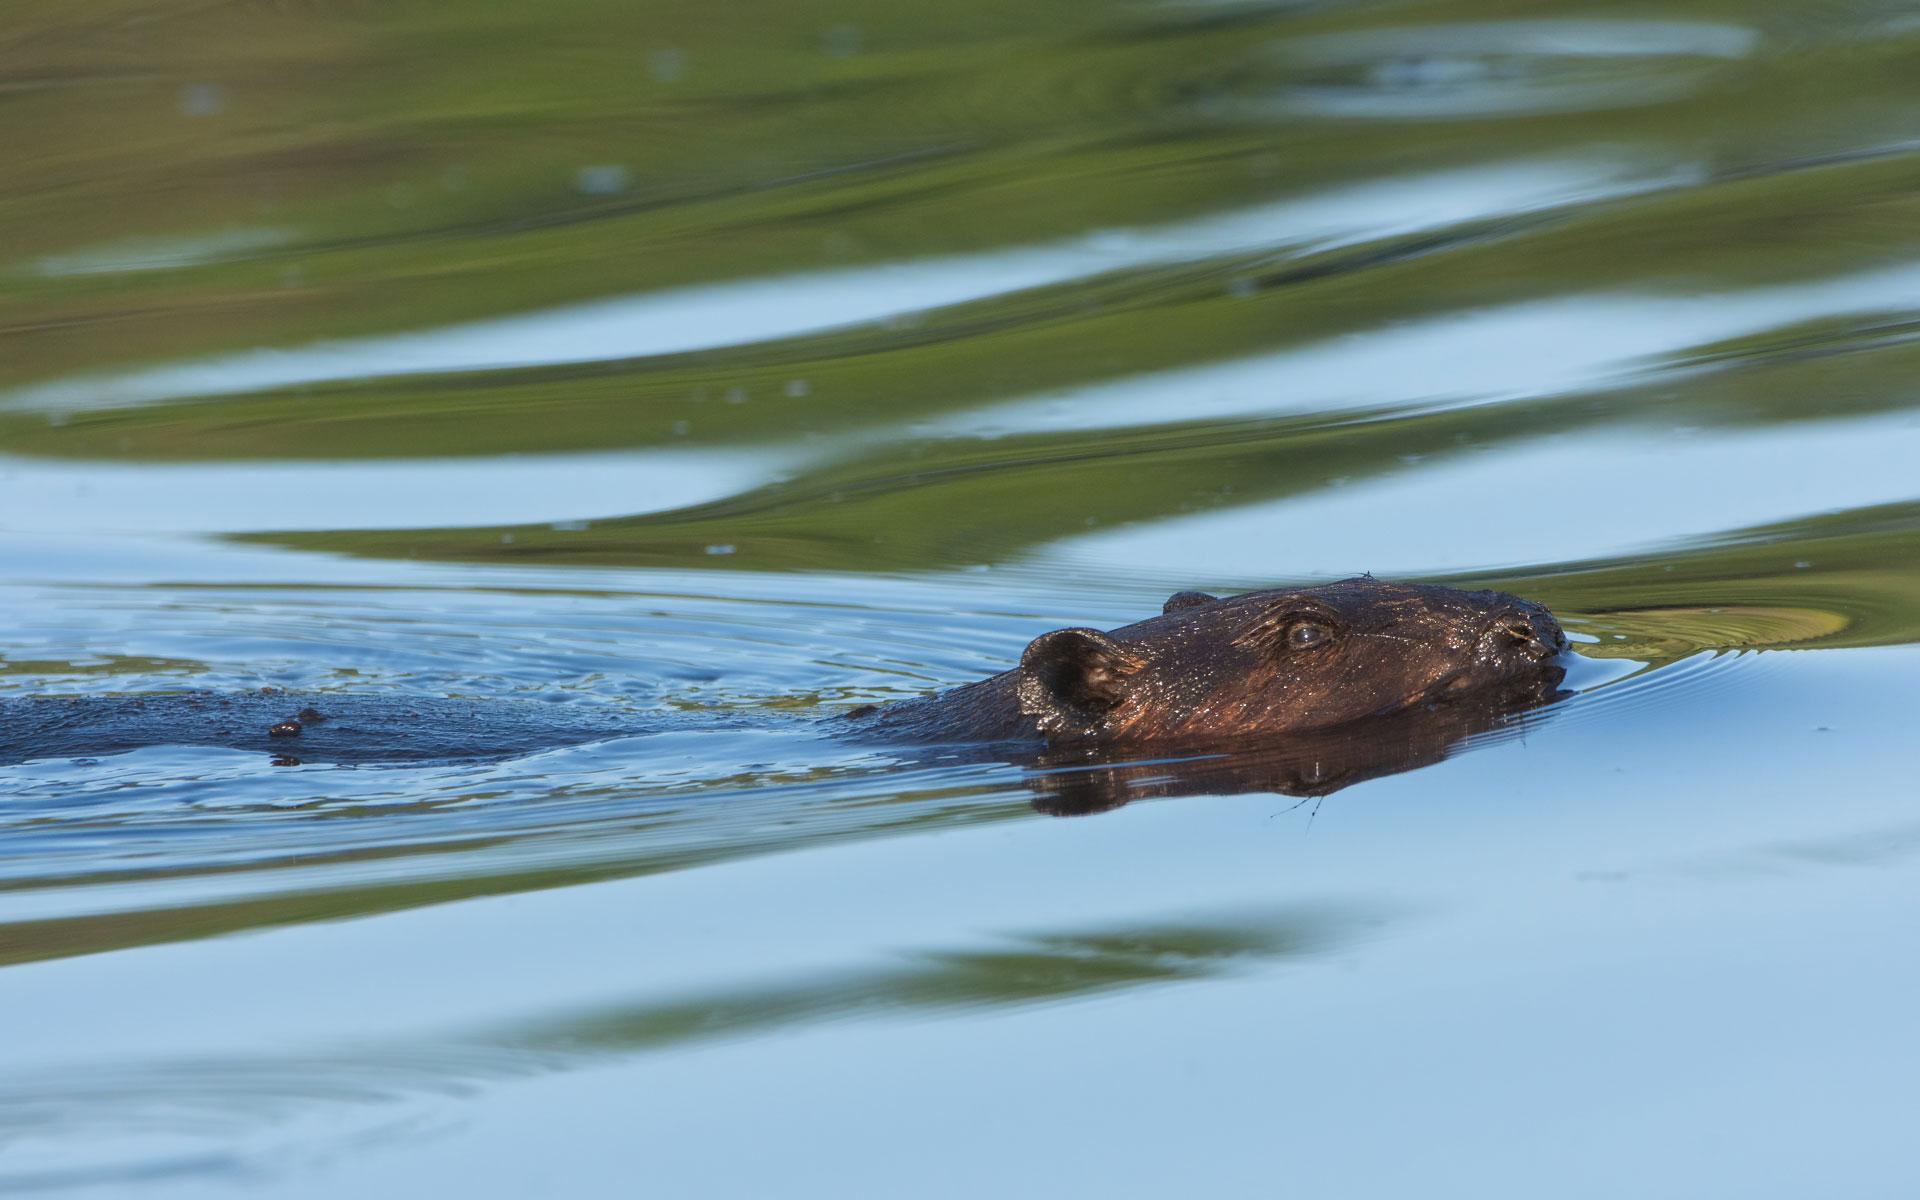 Summer Beaver  (Castor canadensis) - St. Croix Area, MN  Nikon D7200 + Nikon 200-400mm f4 VR1 @ ISO 800